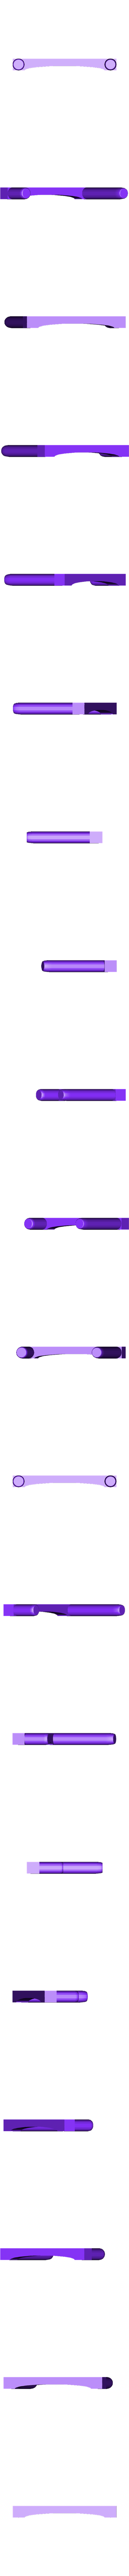 BikeRack70mmLatch.stl Download free STL file Bike Wall Holder • Design to 3D print, Hardcore3D